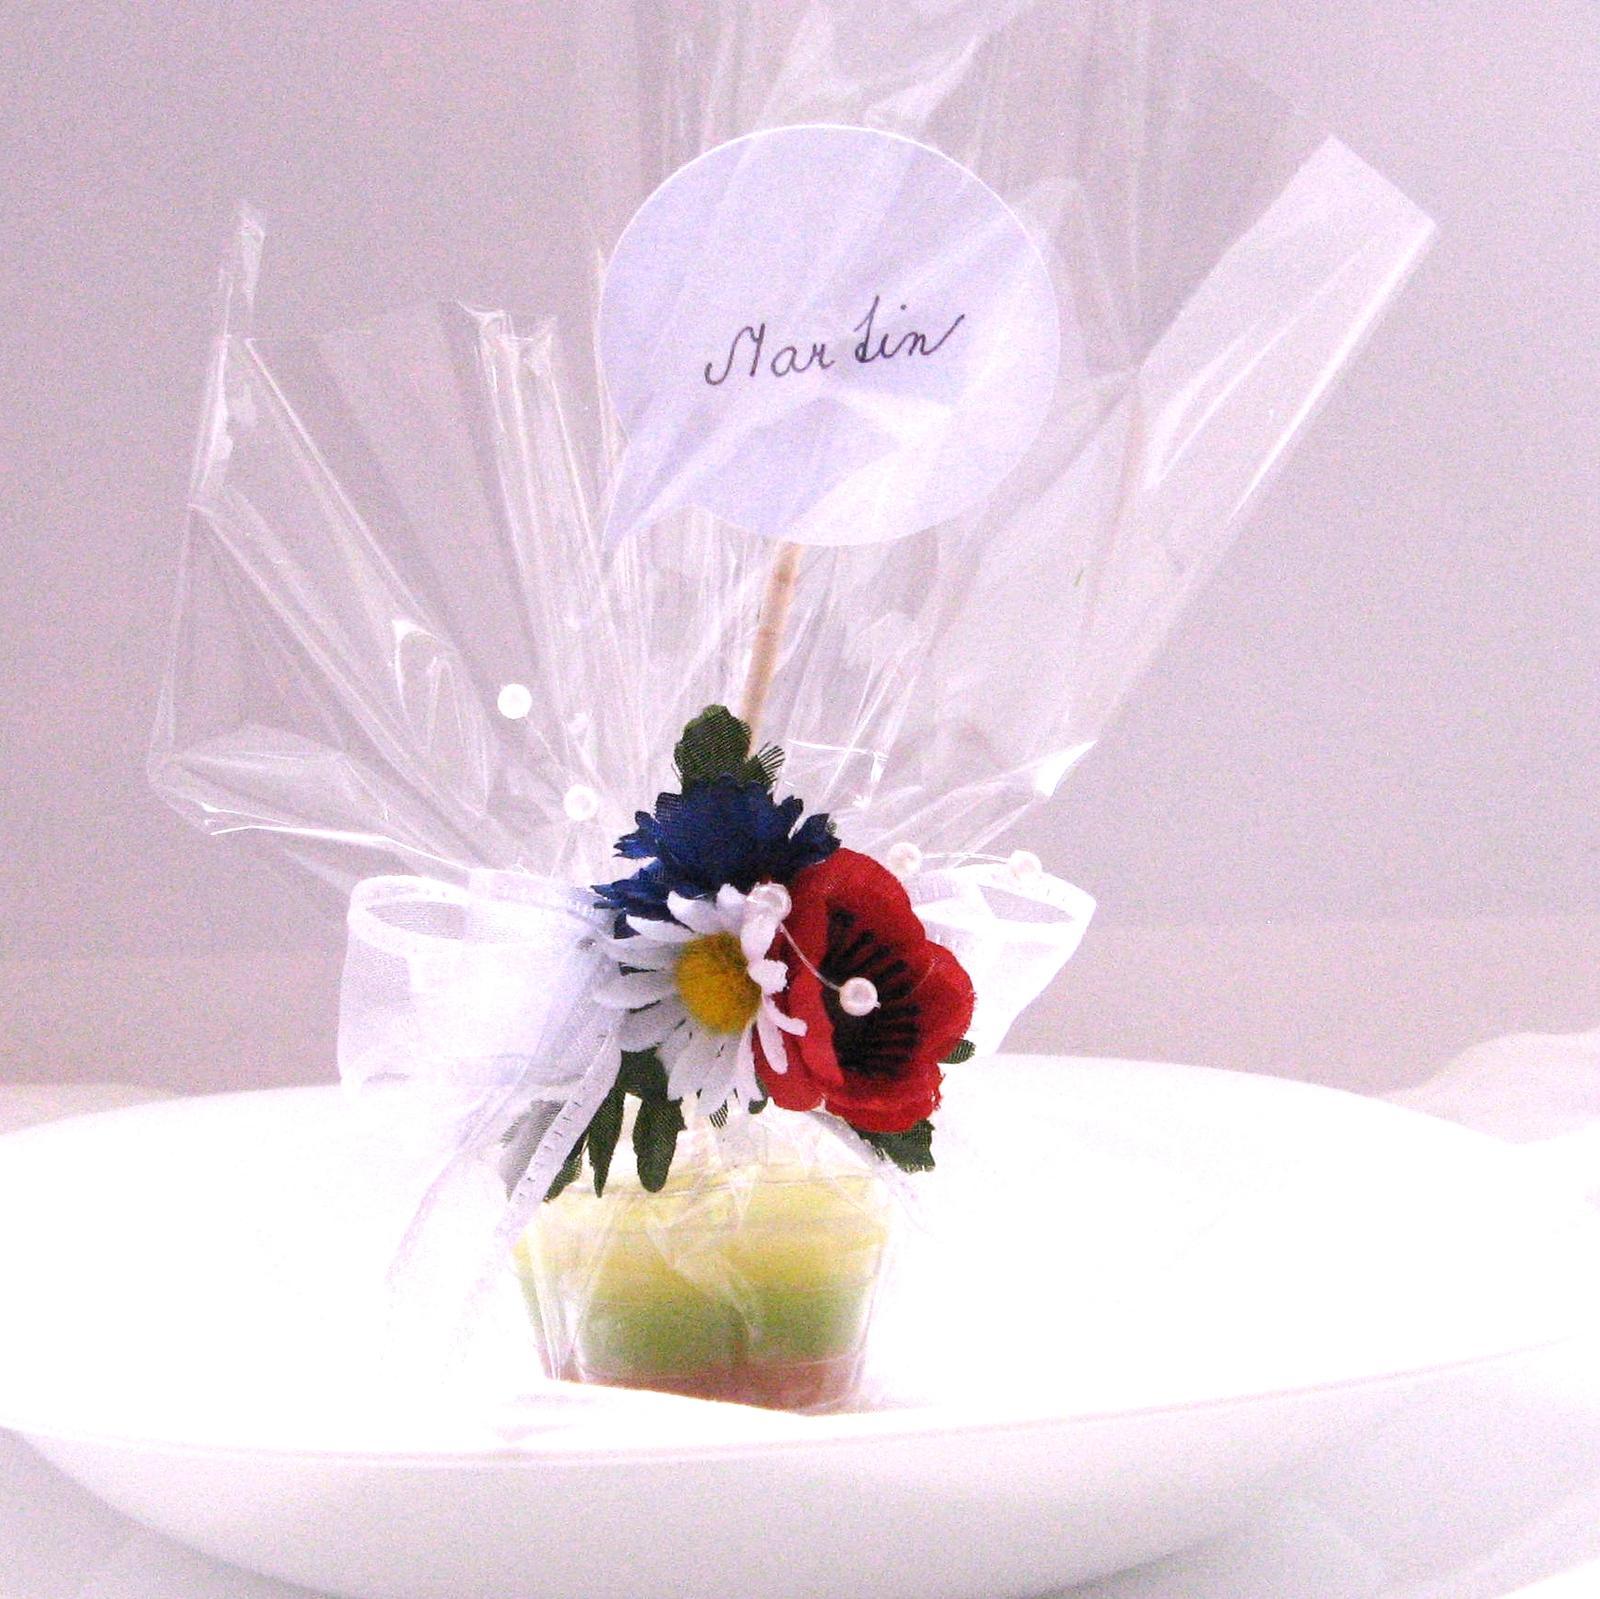 jmenovka - dárek pro hosty 3 - Obrázek č. 1